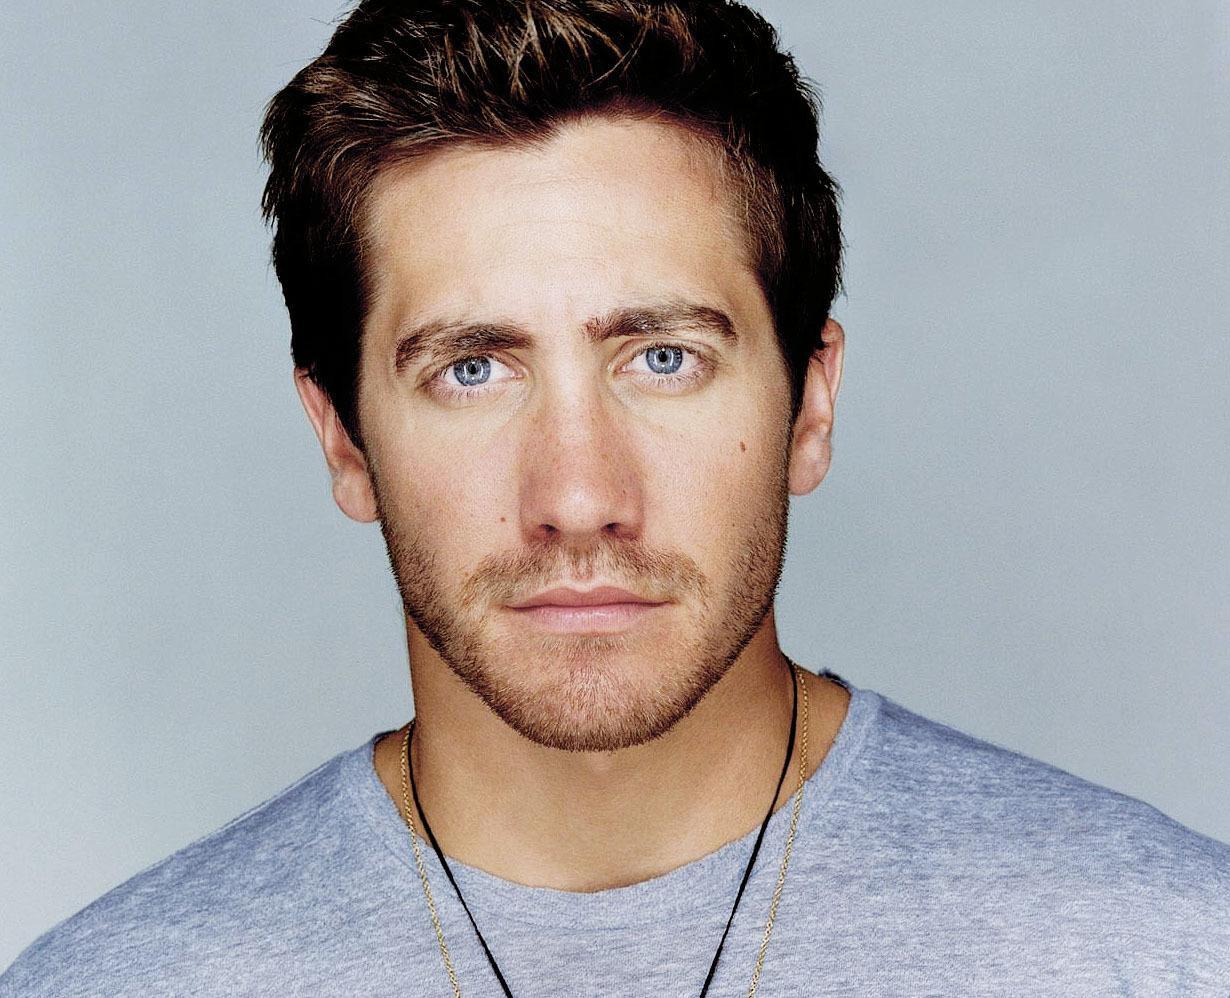 Jake - Jake Gyllenhaal...